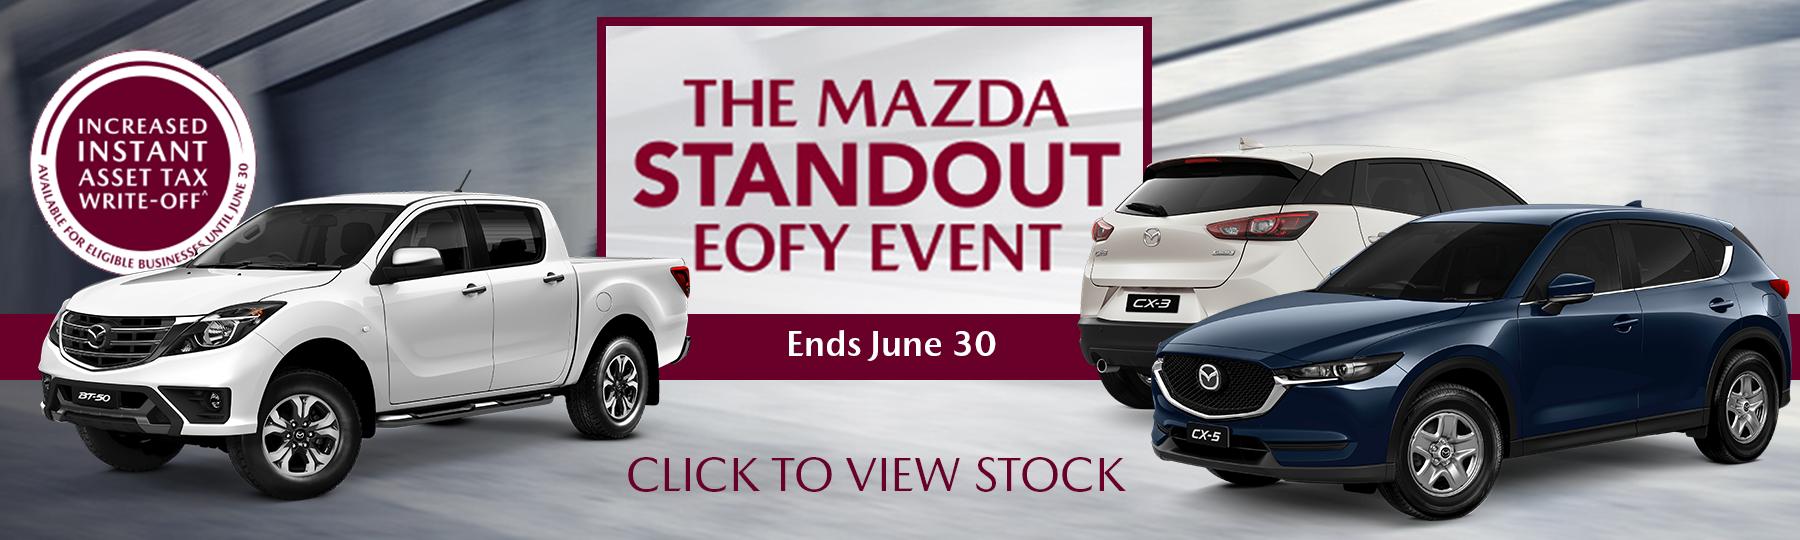 Mazda EOFY Event